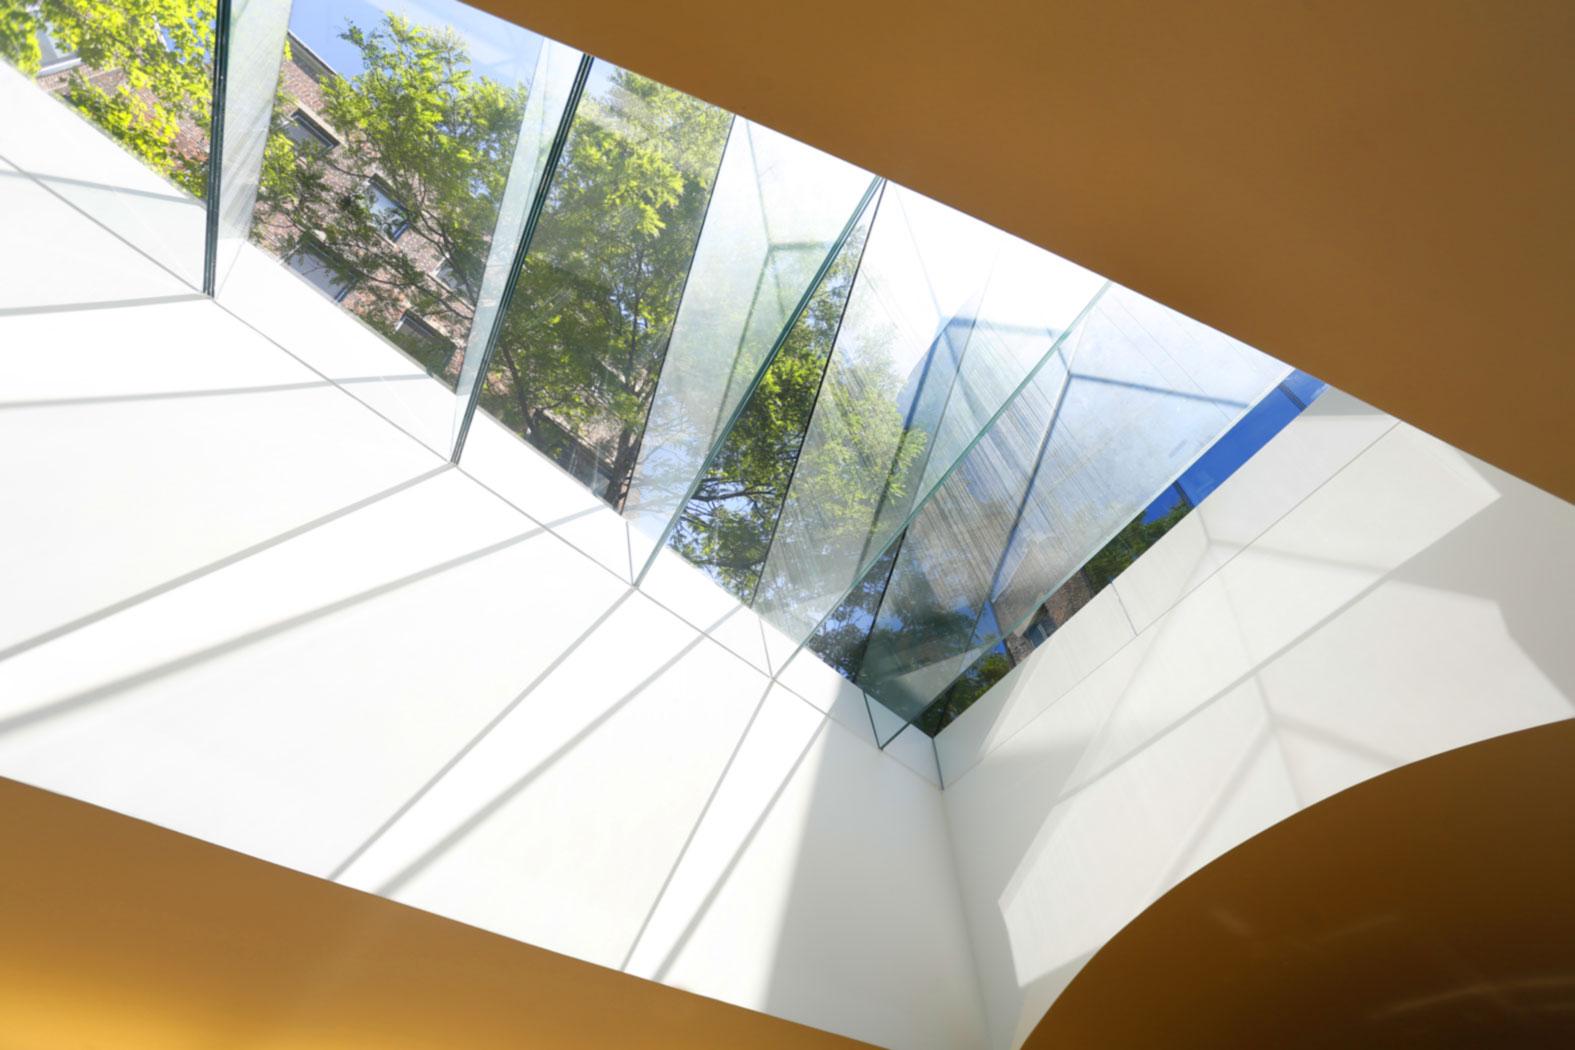 Harvard Fung Library Skylight